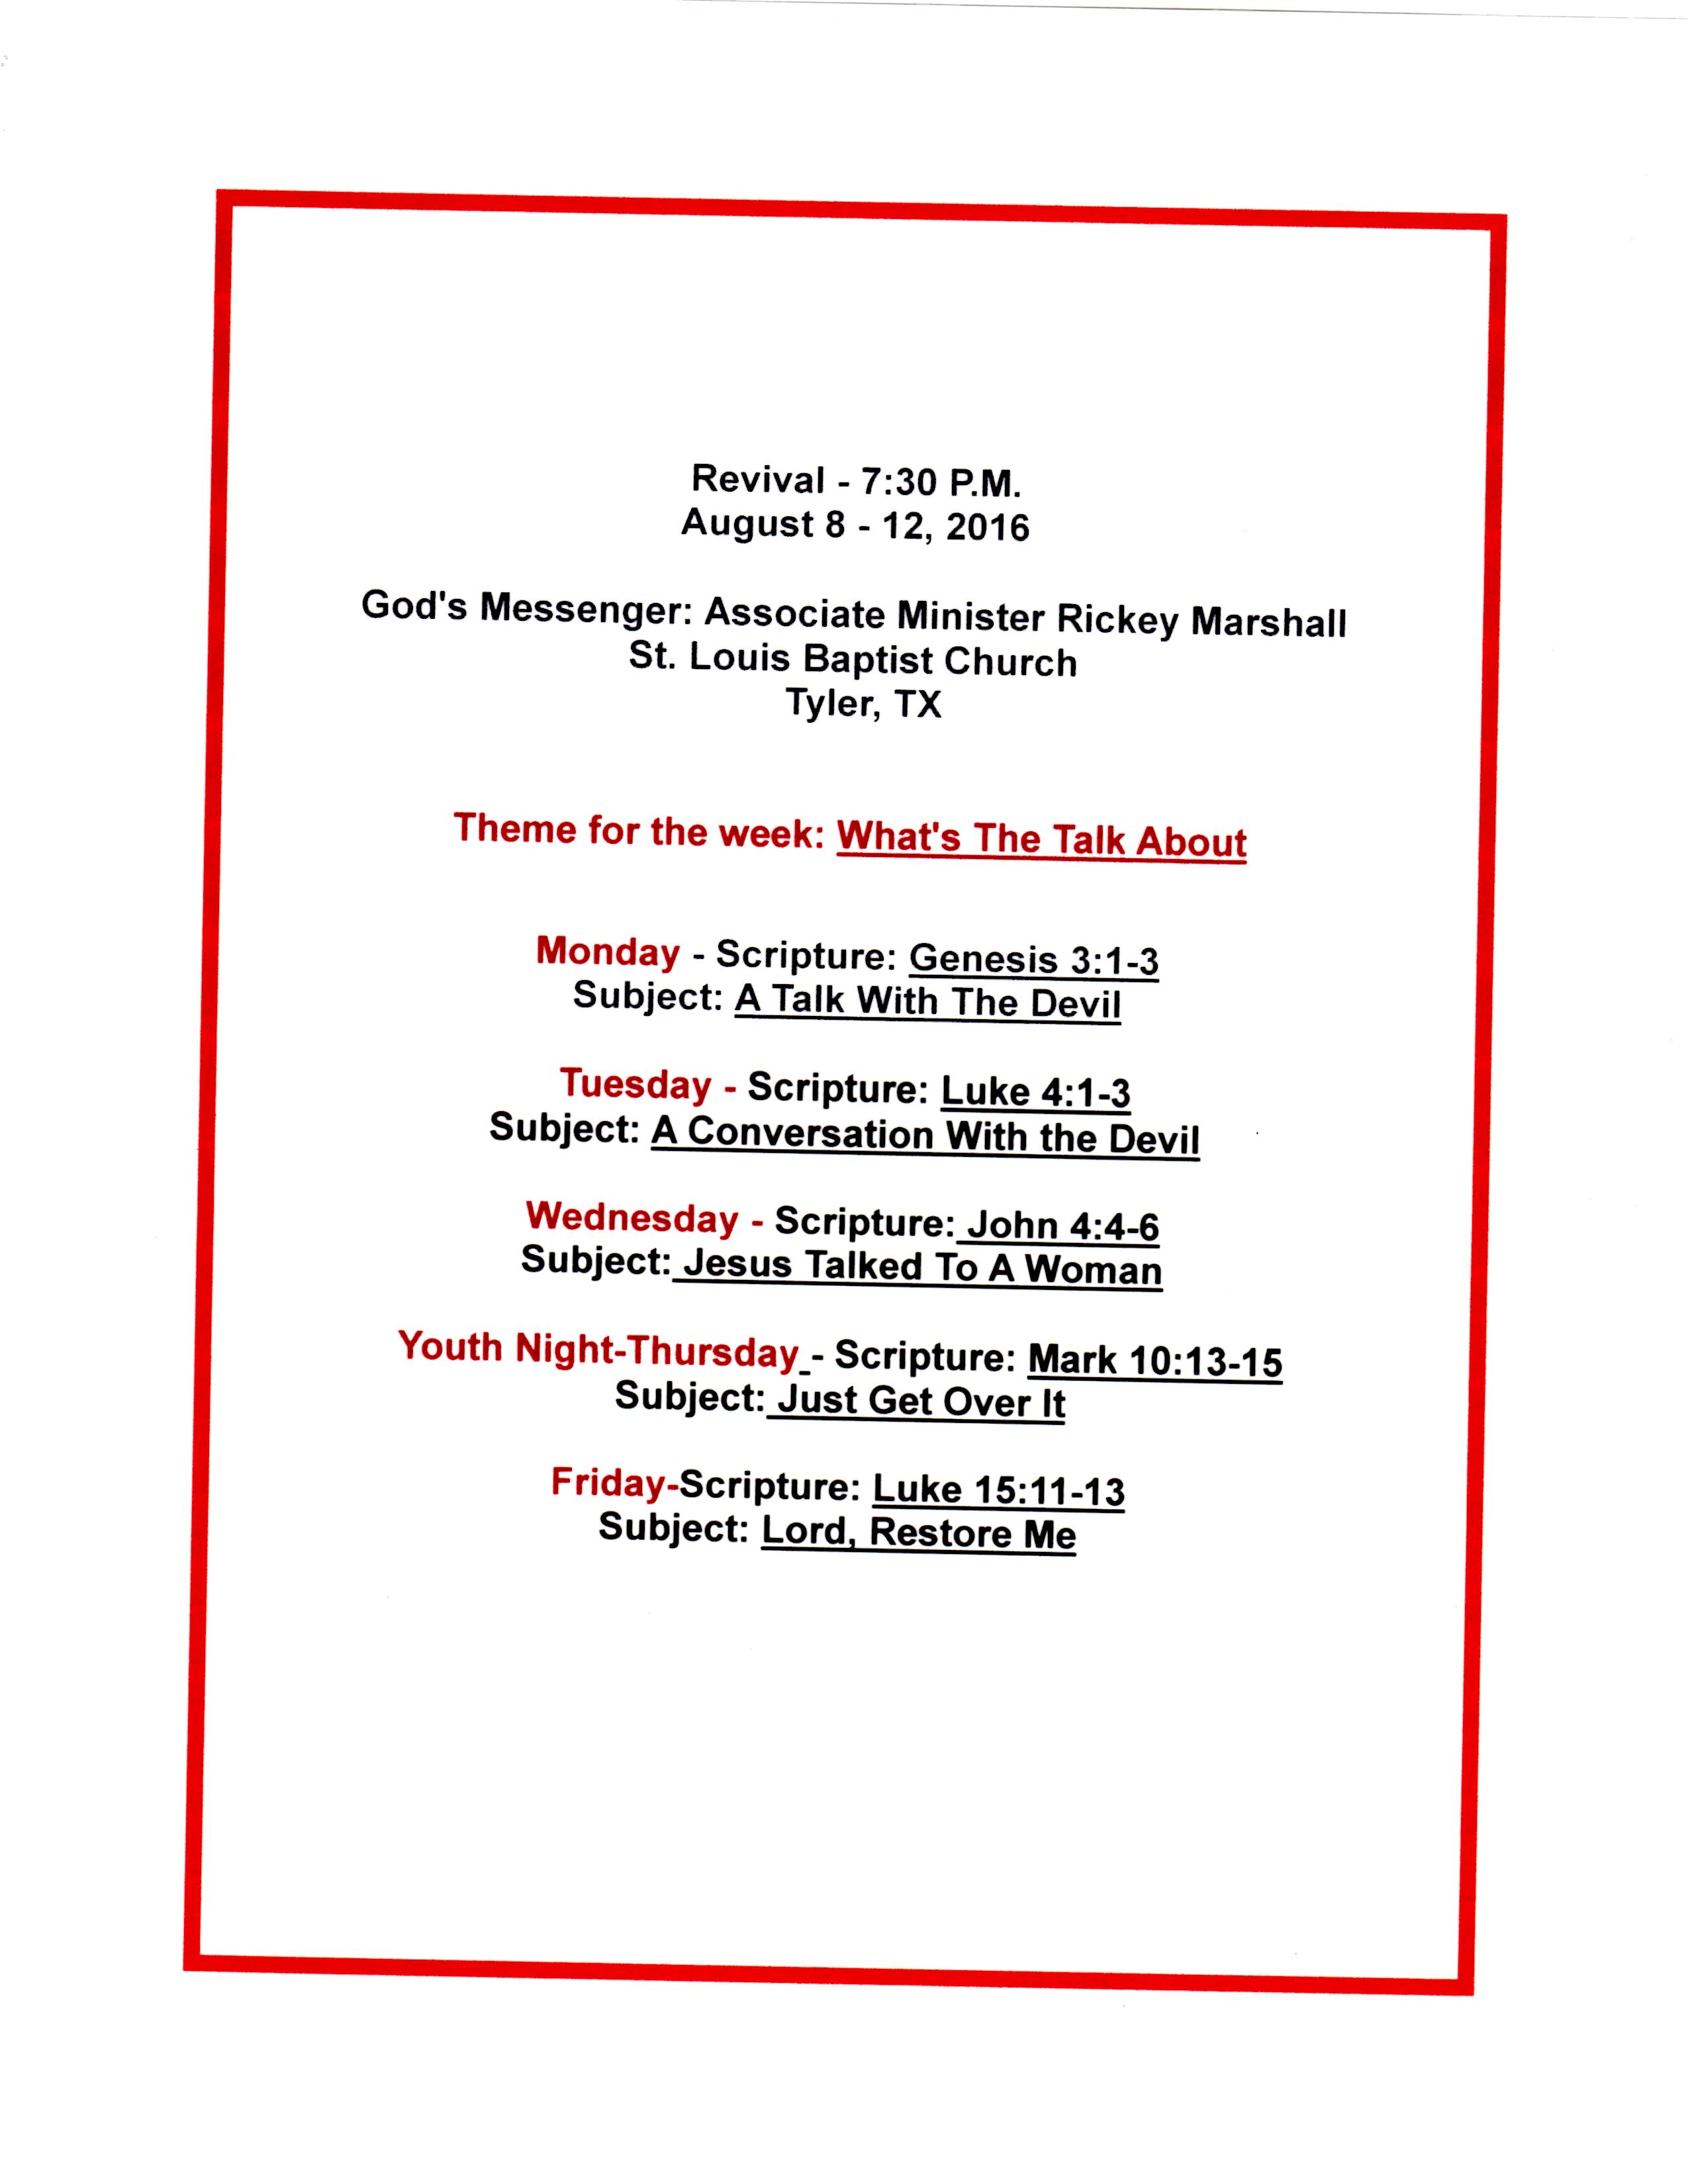 List of Rev. Rickey Marshall's Revival Sermons 8-8-12-2016